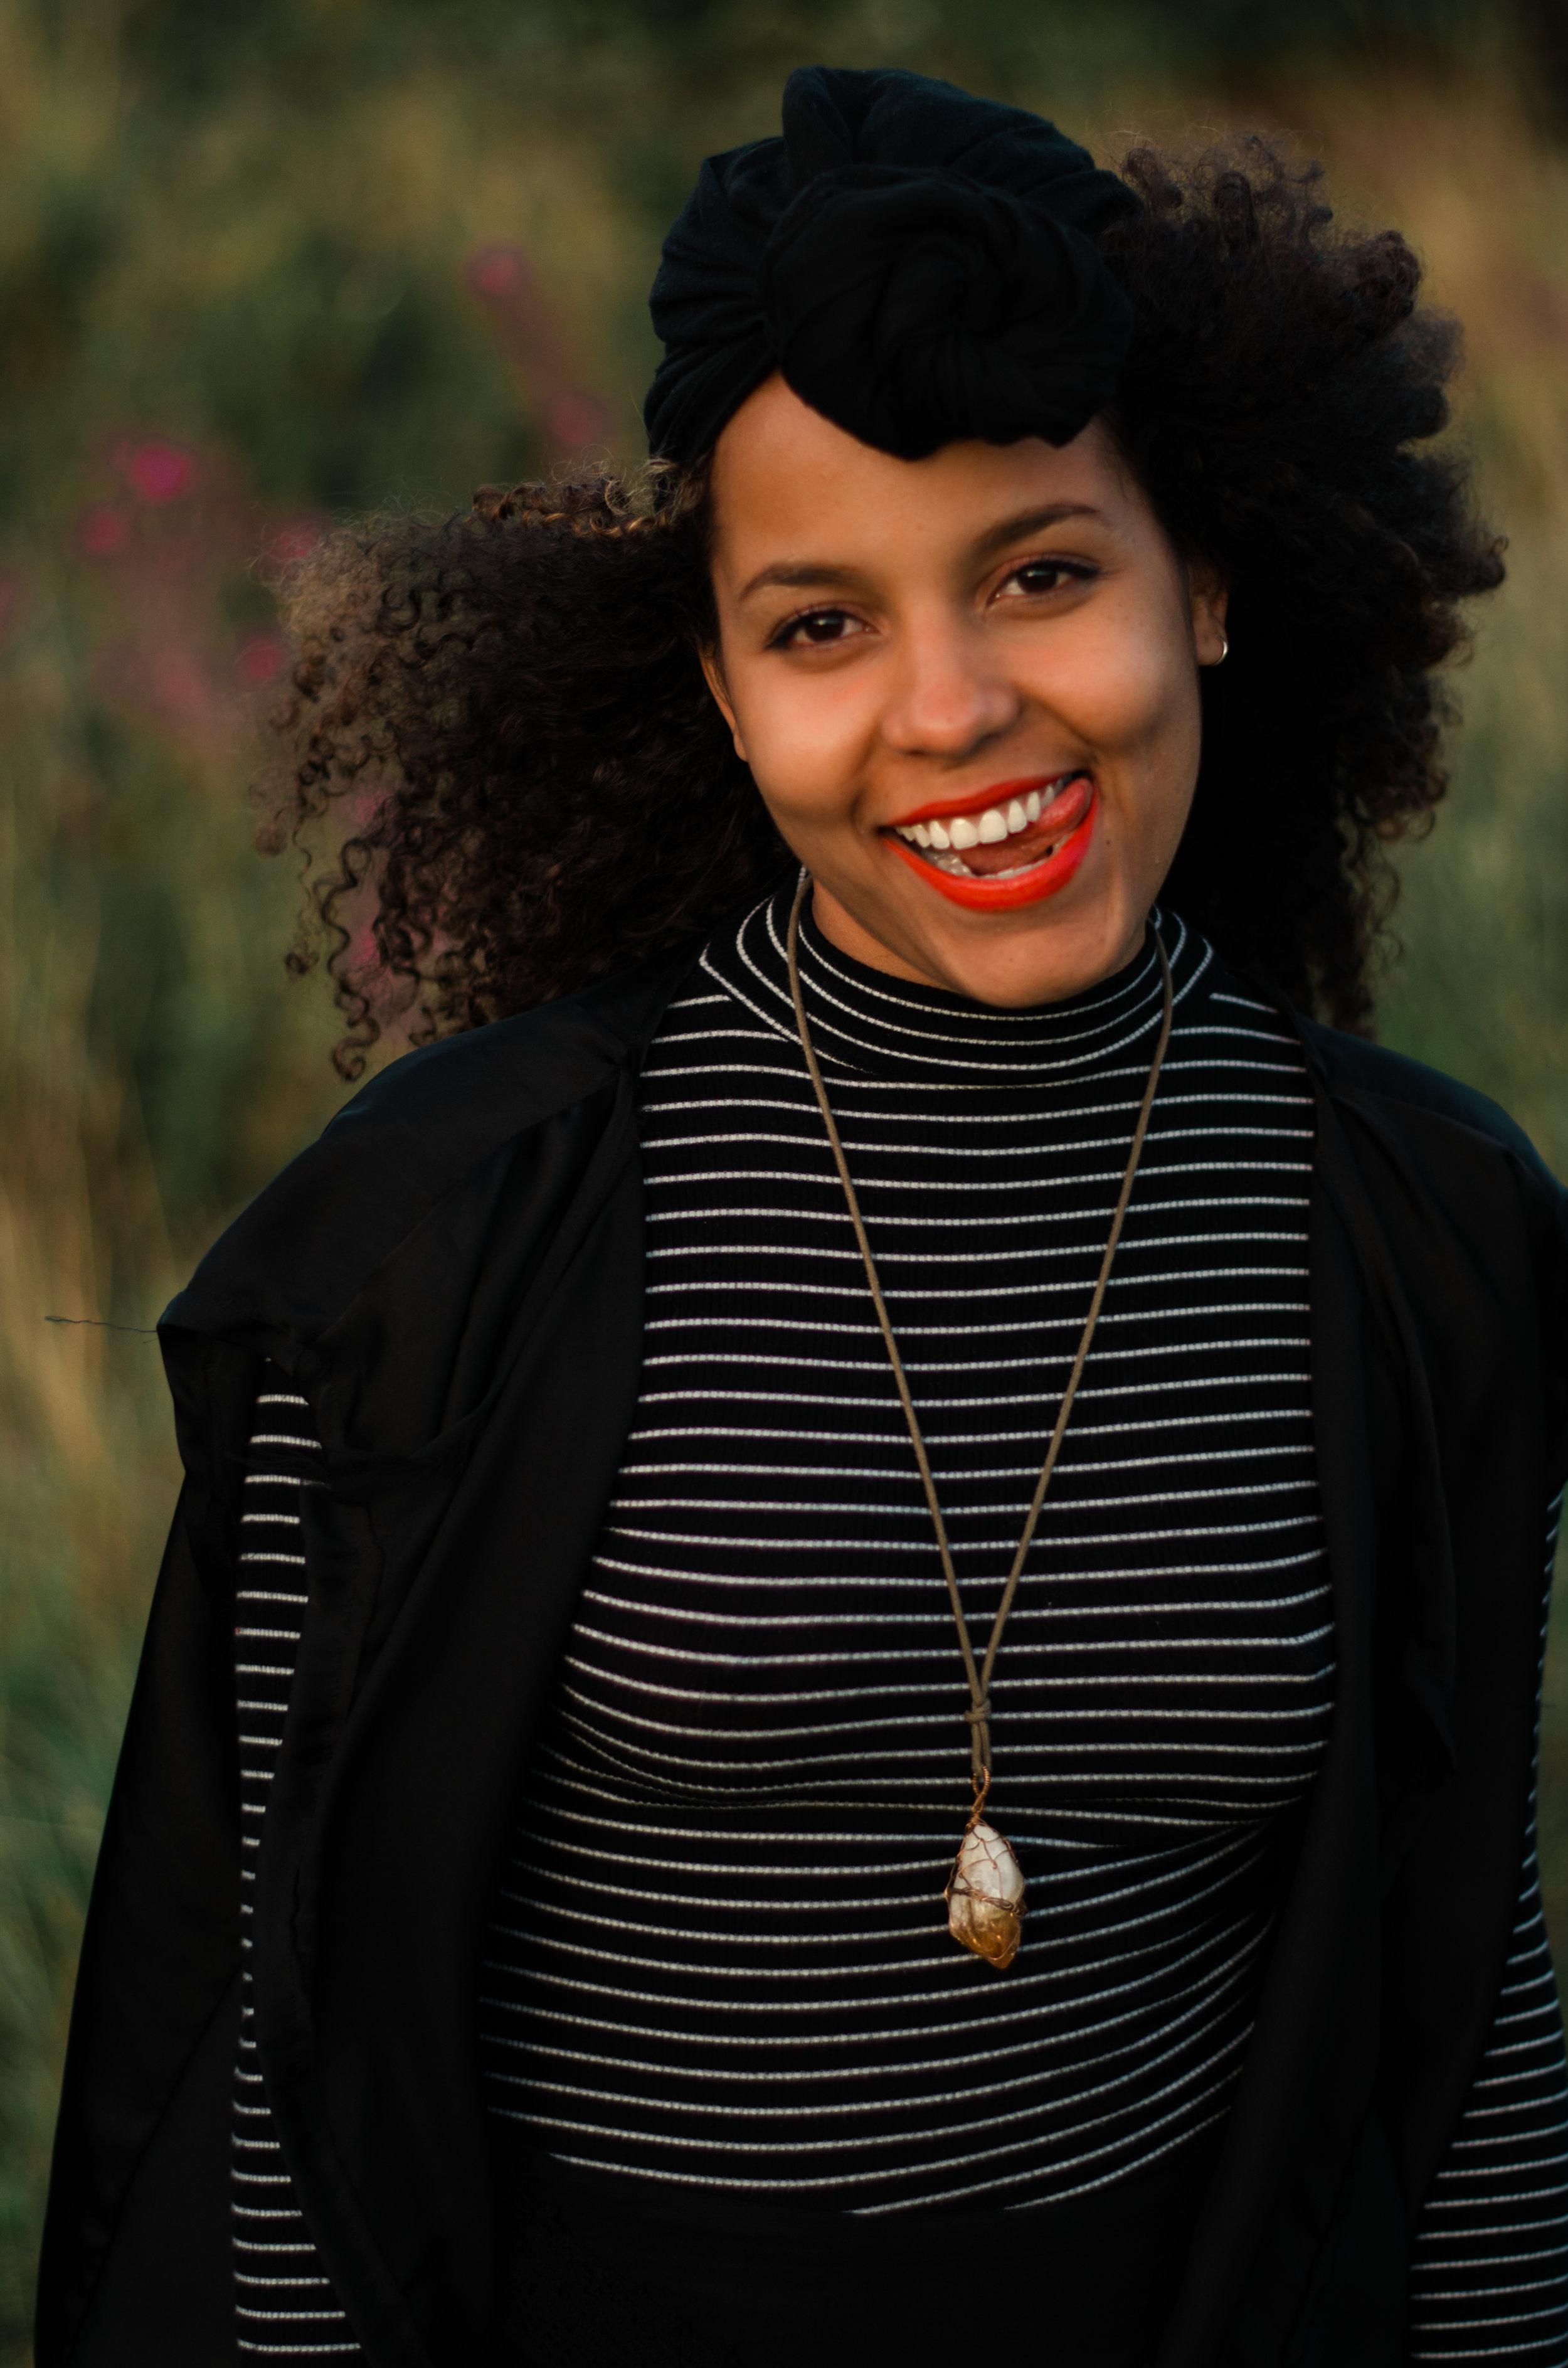 Inka-Portrait-Session-Aiste-Saulyte-Photography-17-07-30-523.jpg